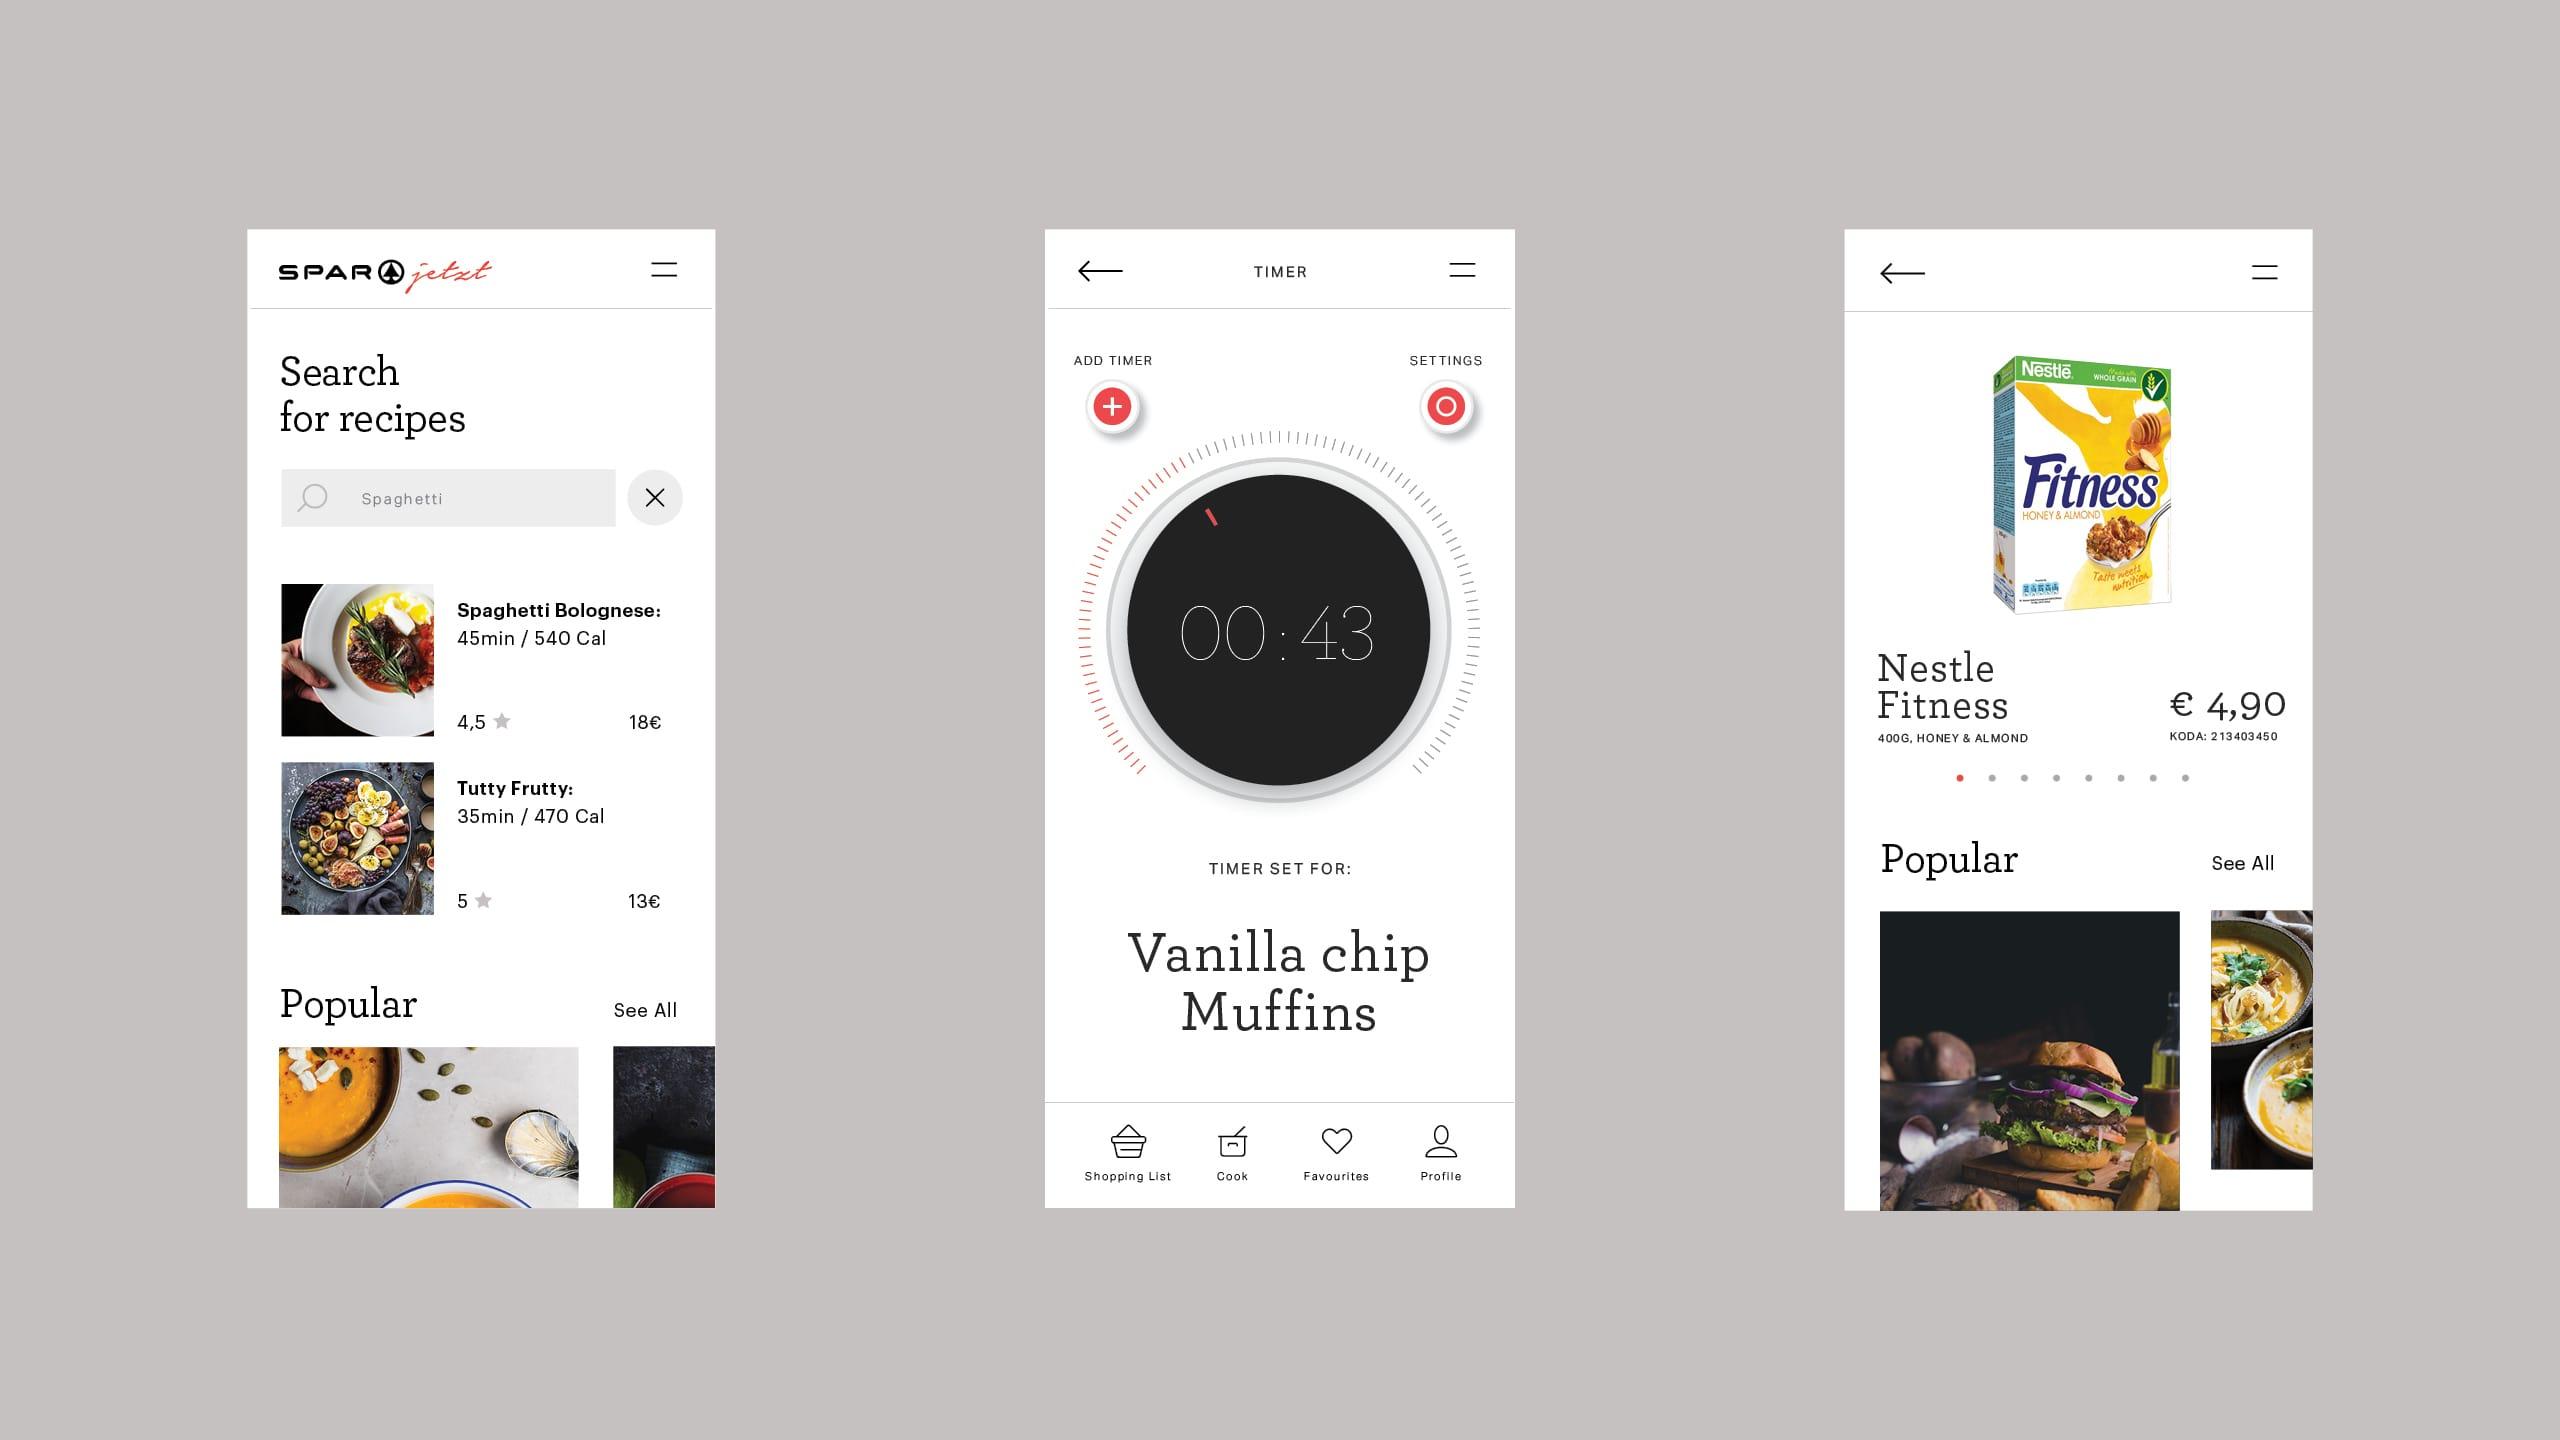 mantik-digital-branding-development-agency-chocolate-packaging-webdesign-design-app-ui-shopping-grocery-store15-min